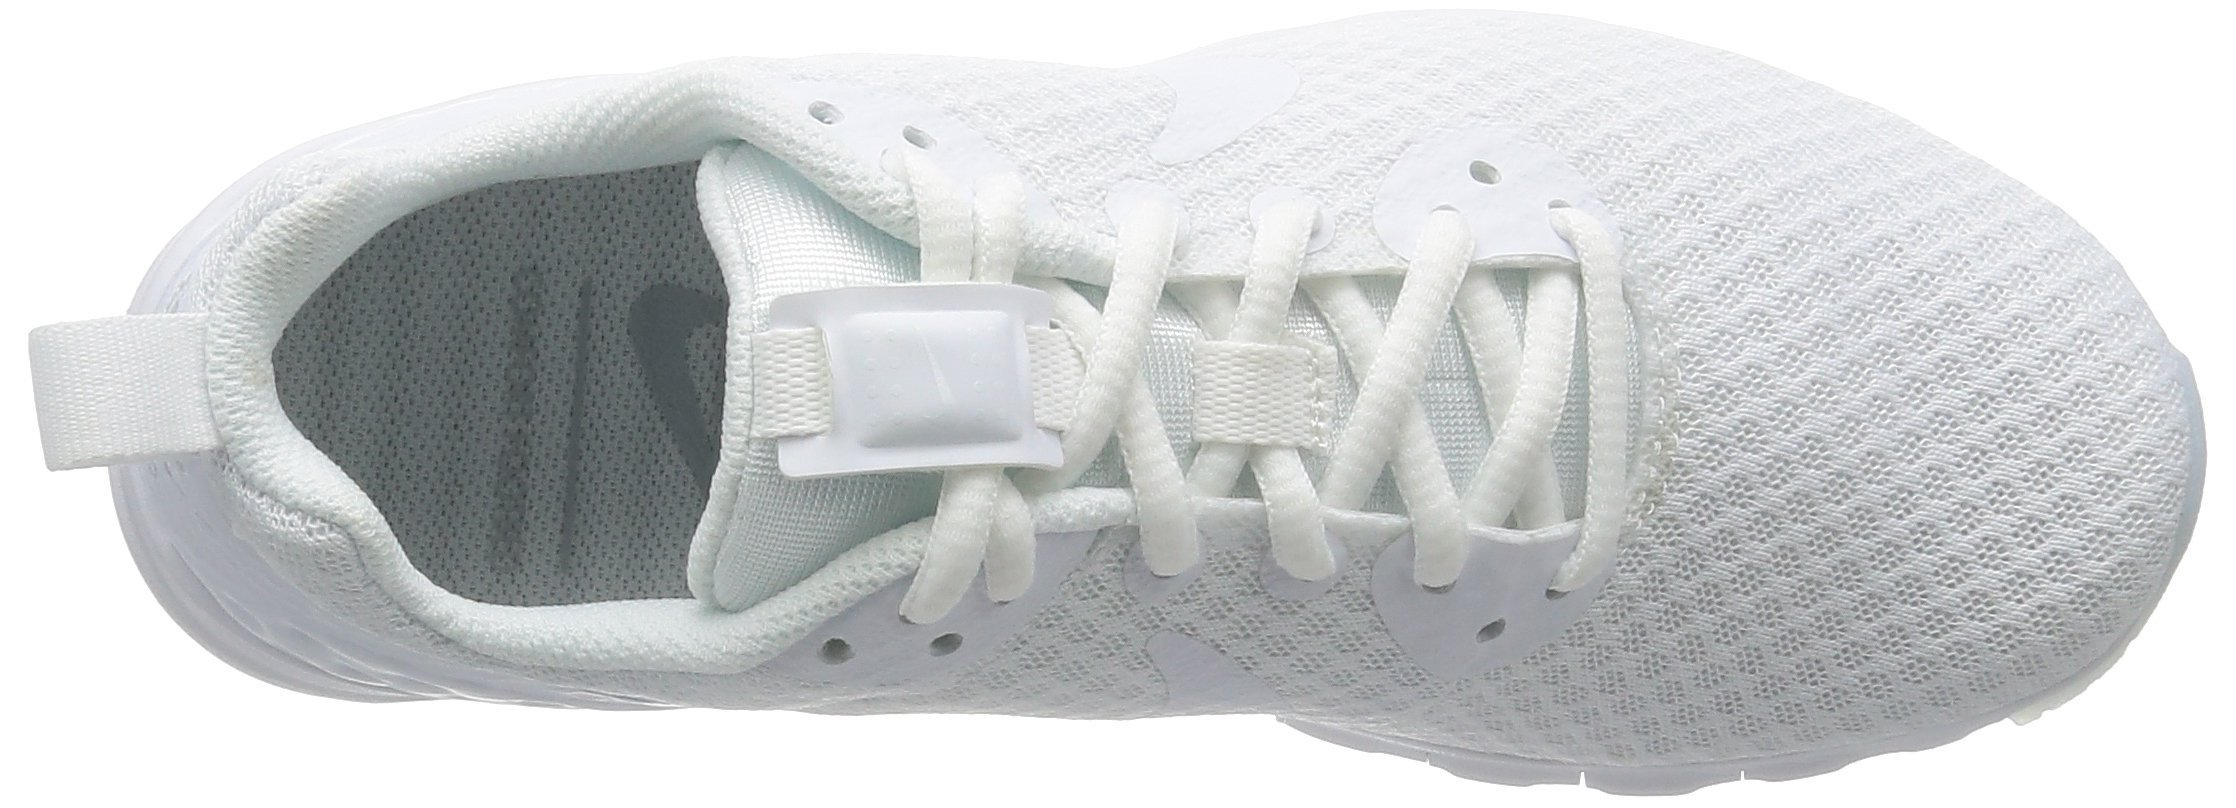 NIKE Women's Air Max Motion LW Running Shoe, White/White, 8.5 M US by NIKE (Image #7)